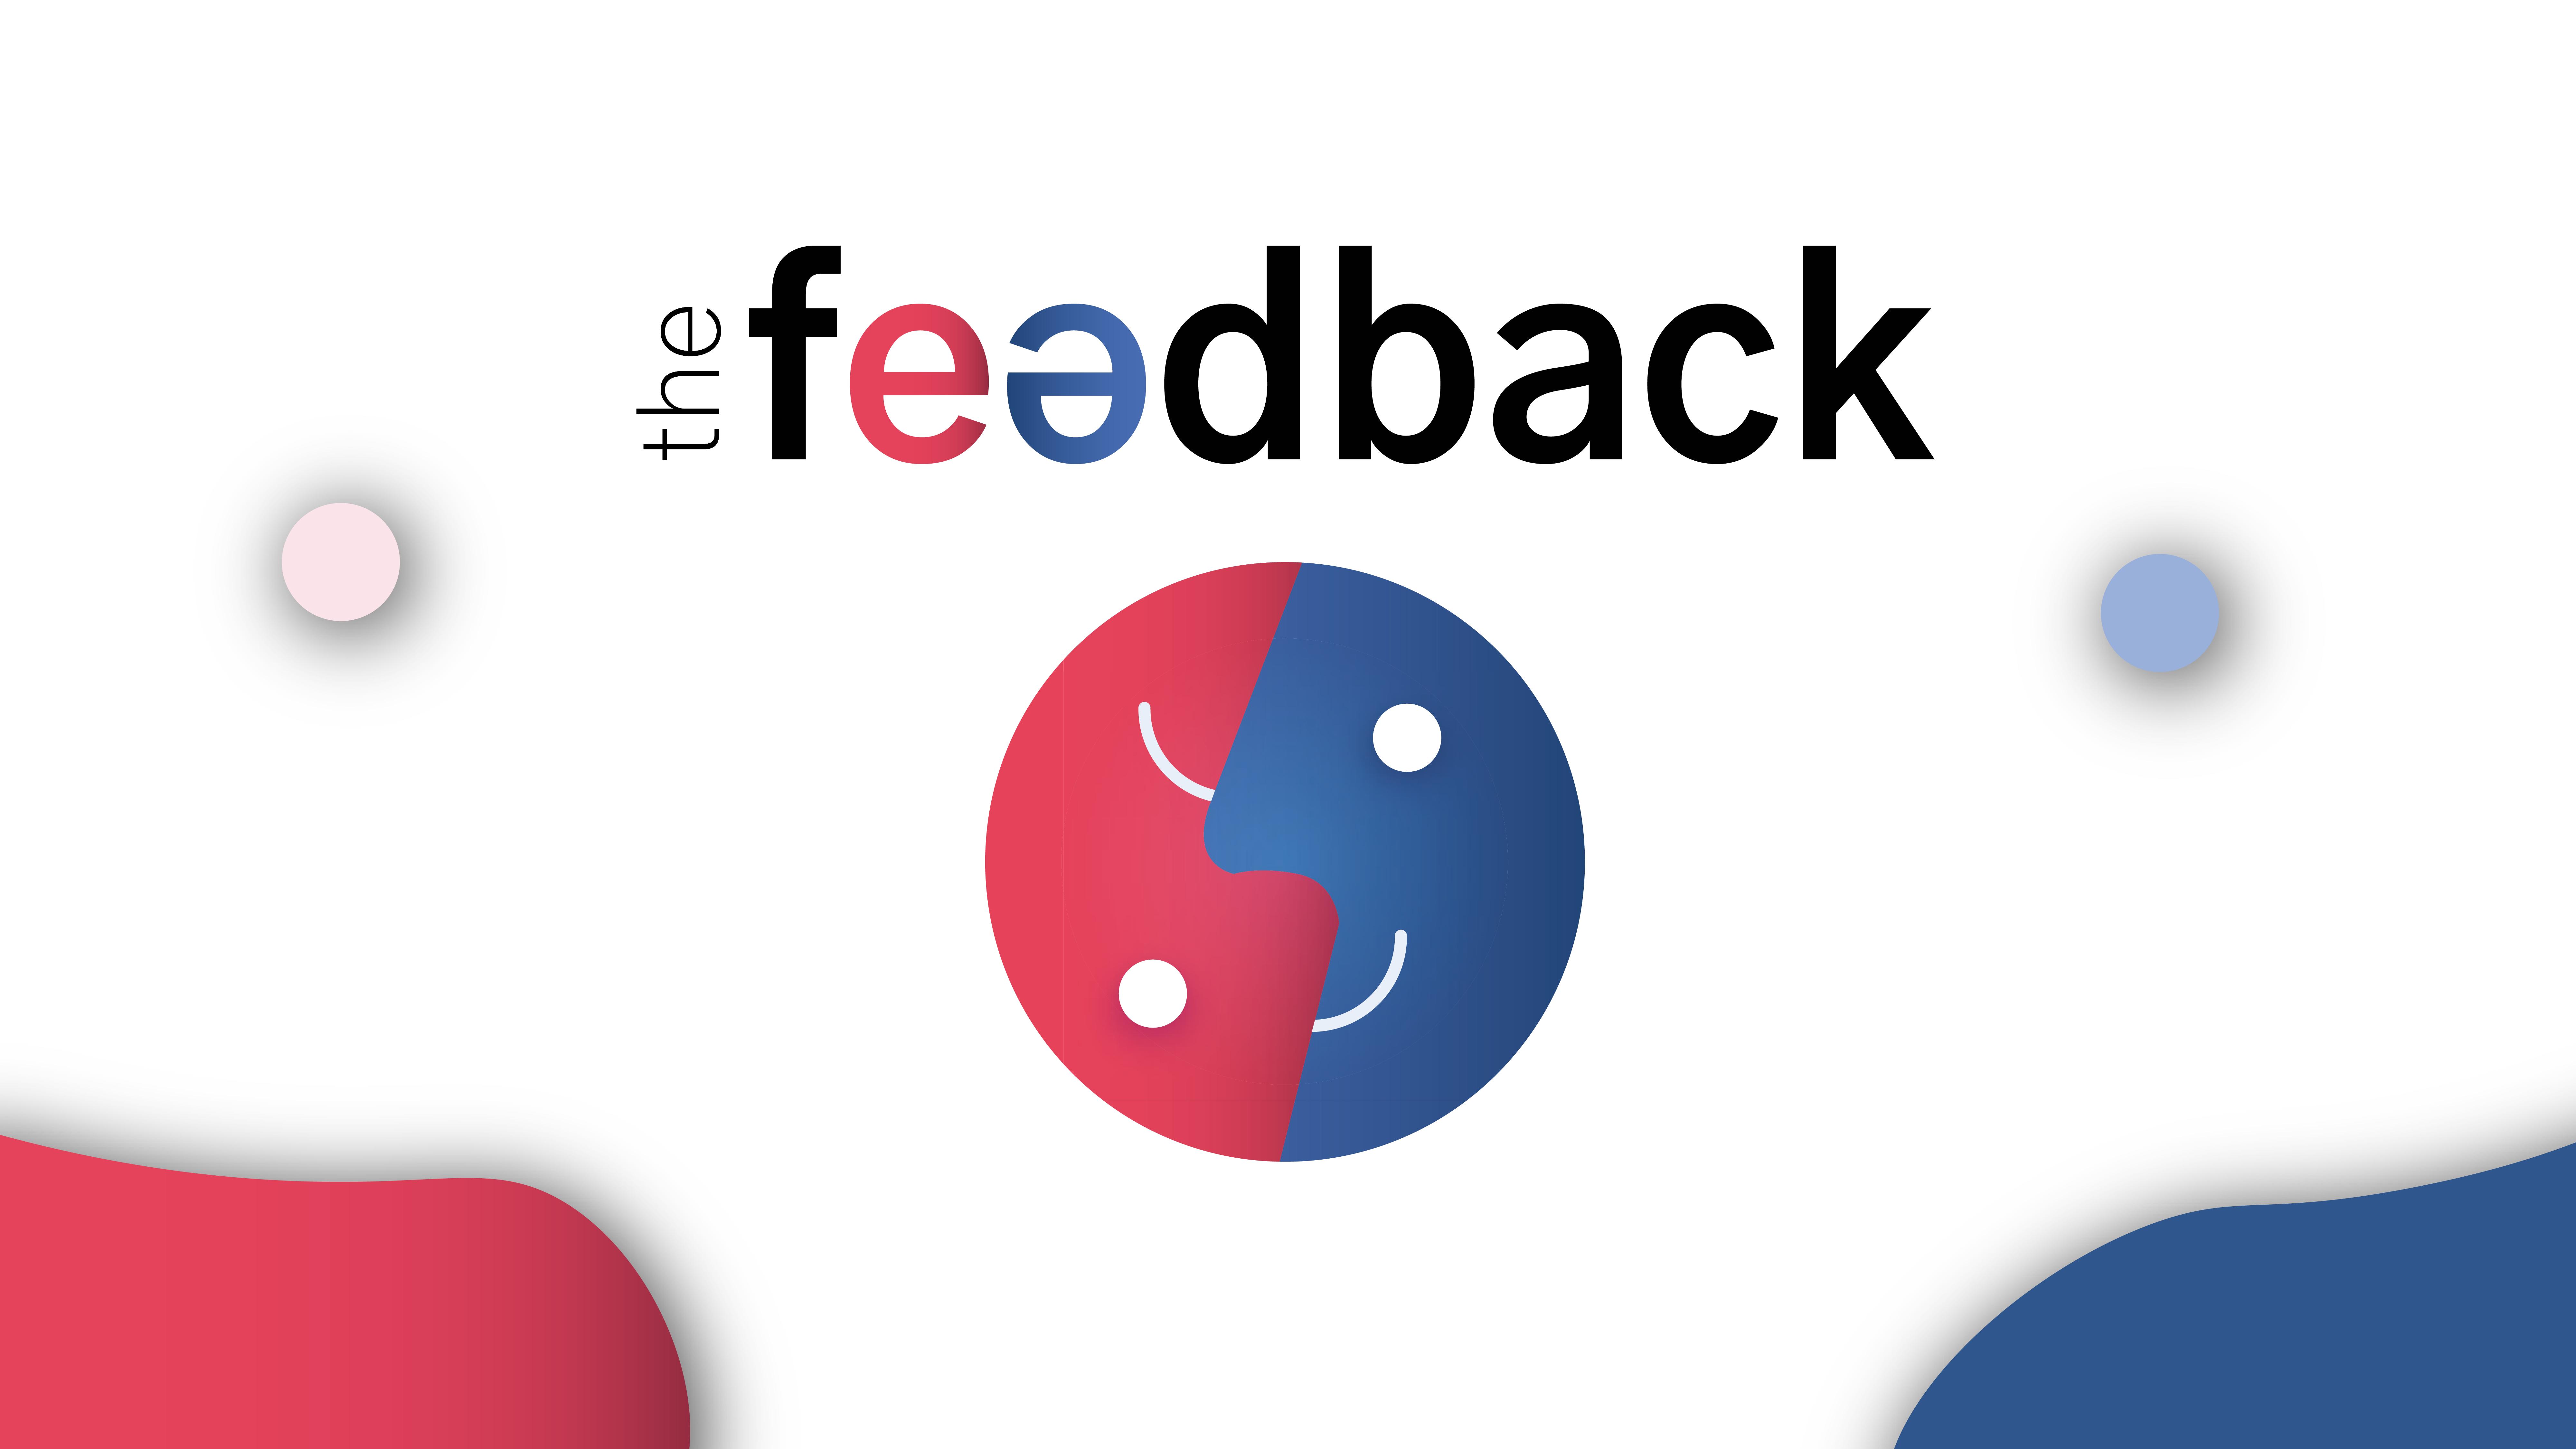 App The Feedback